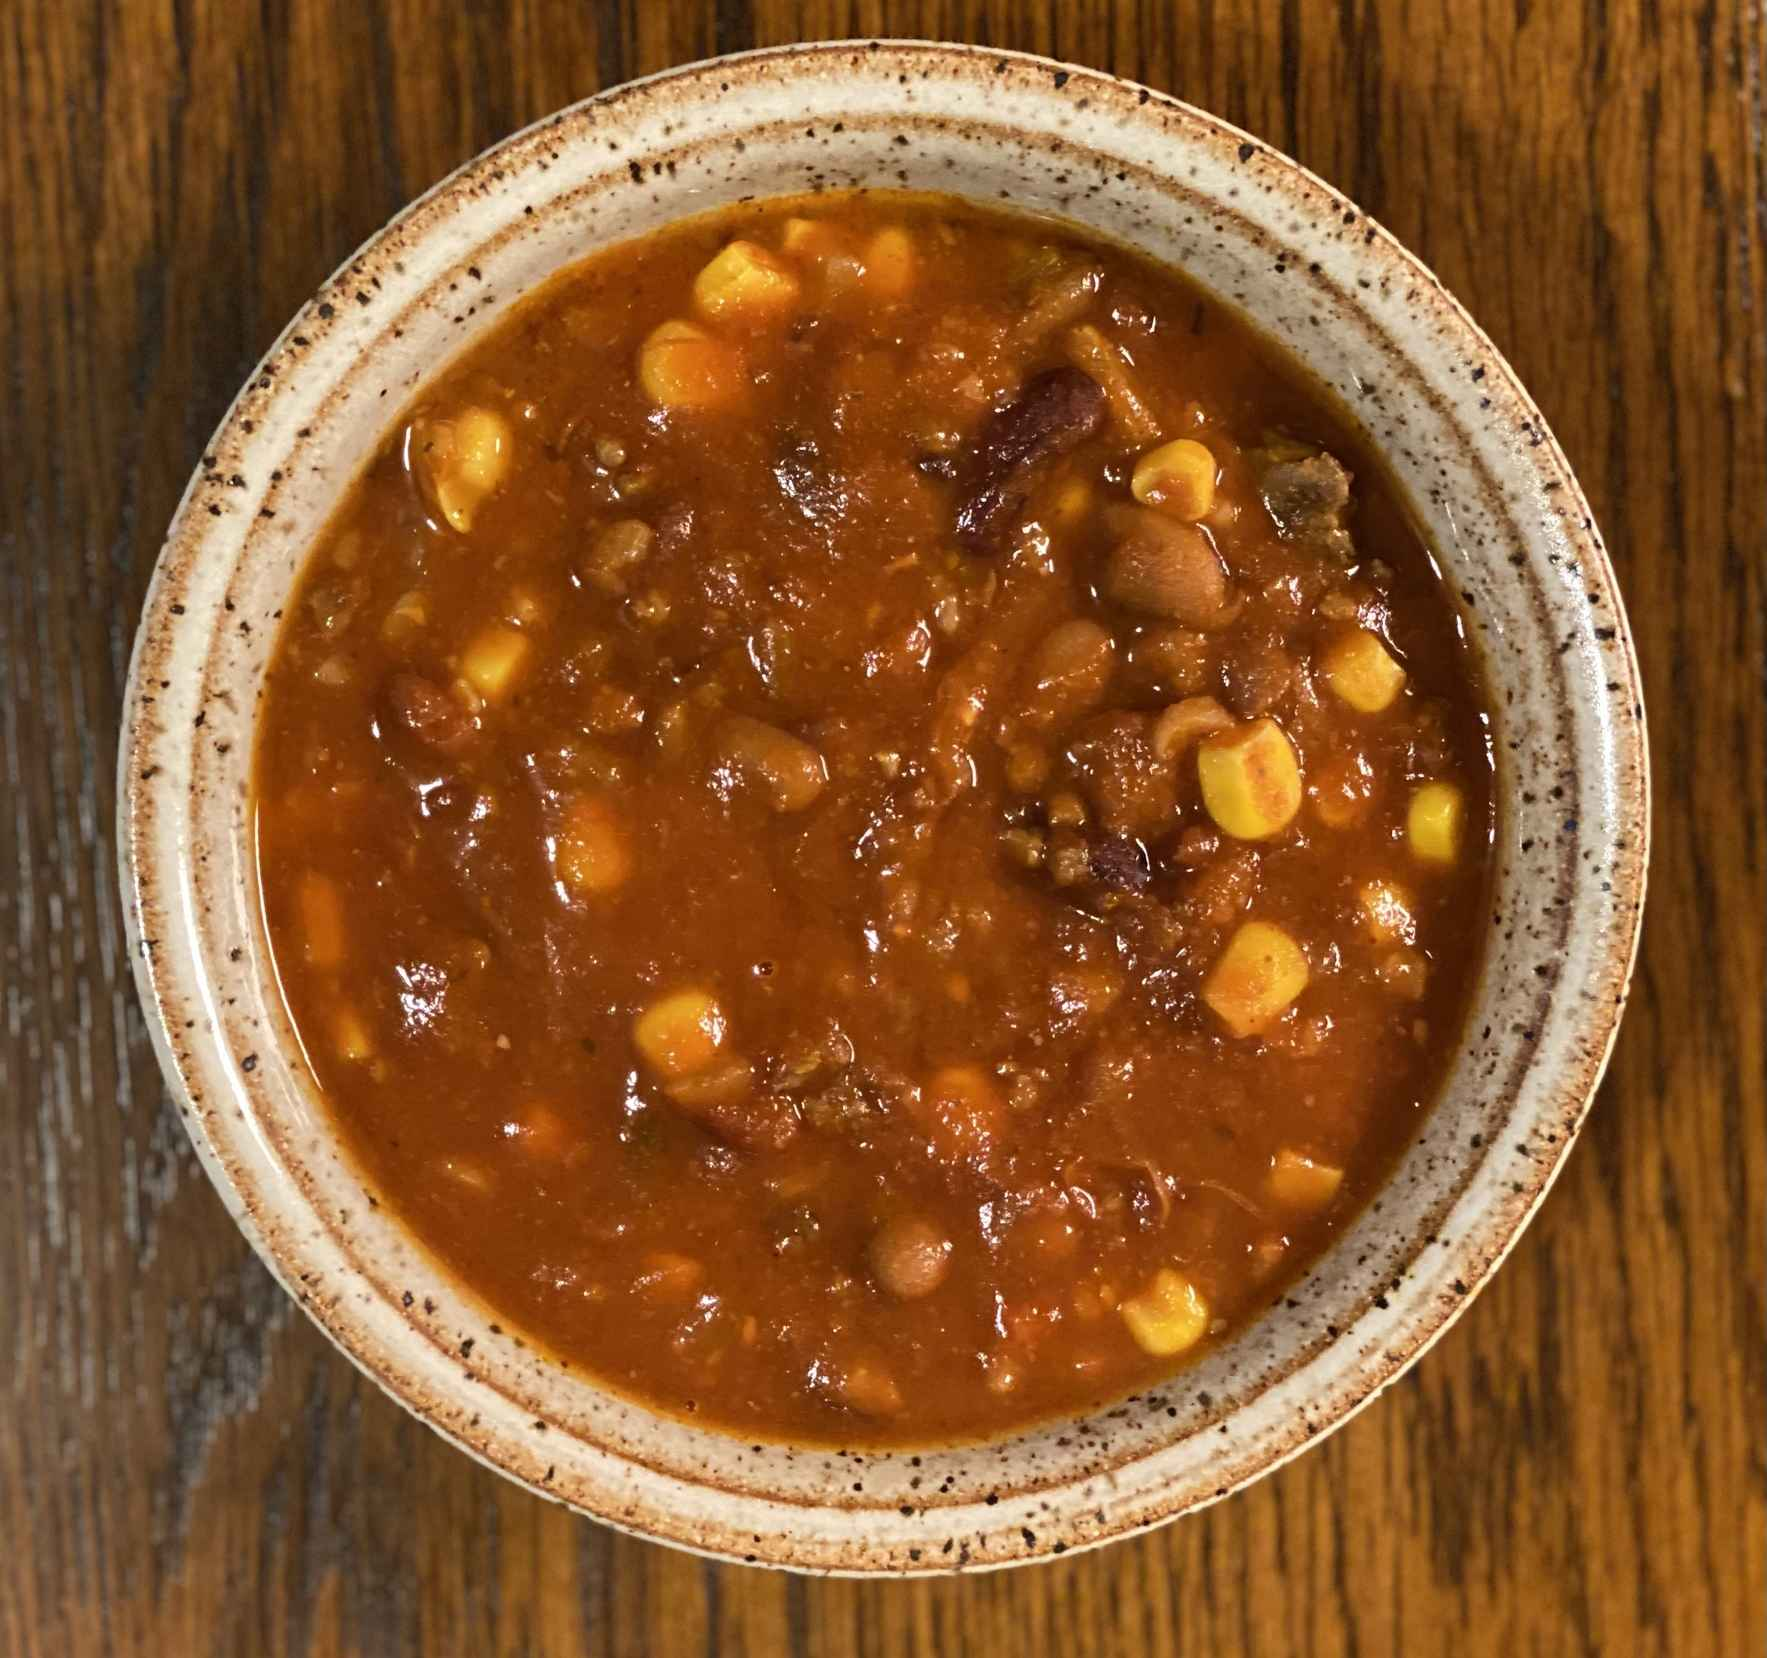 Chili Dinner image